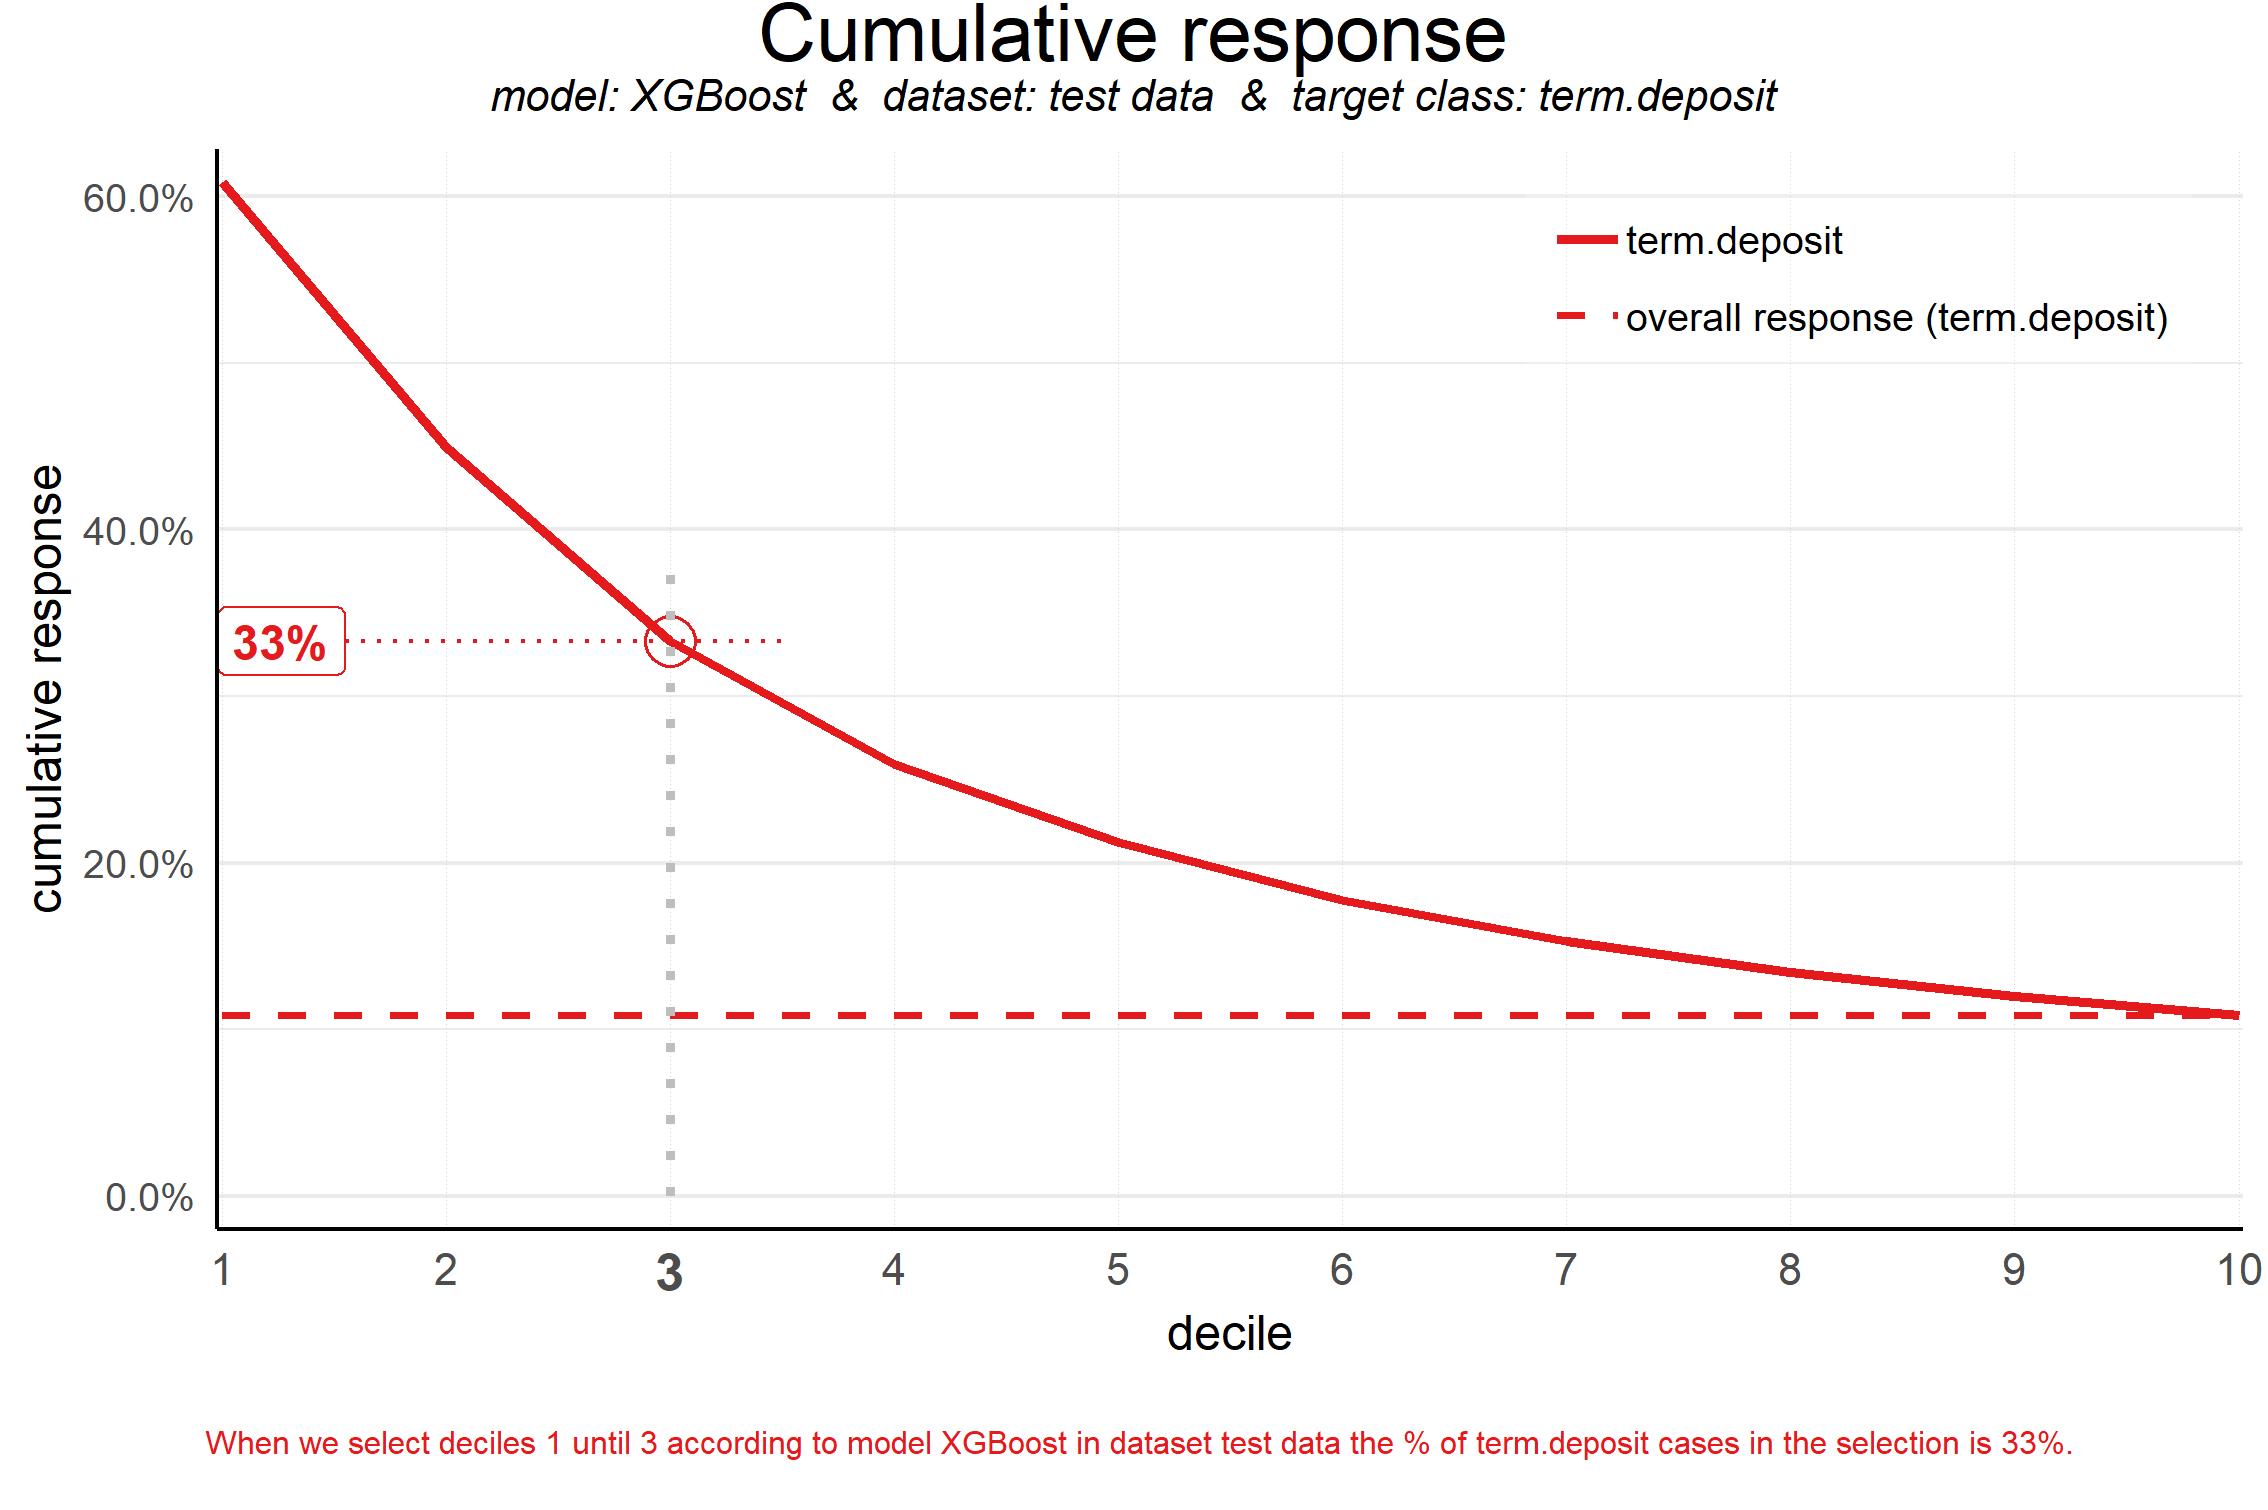 plot of chunk cumresponseplot